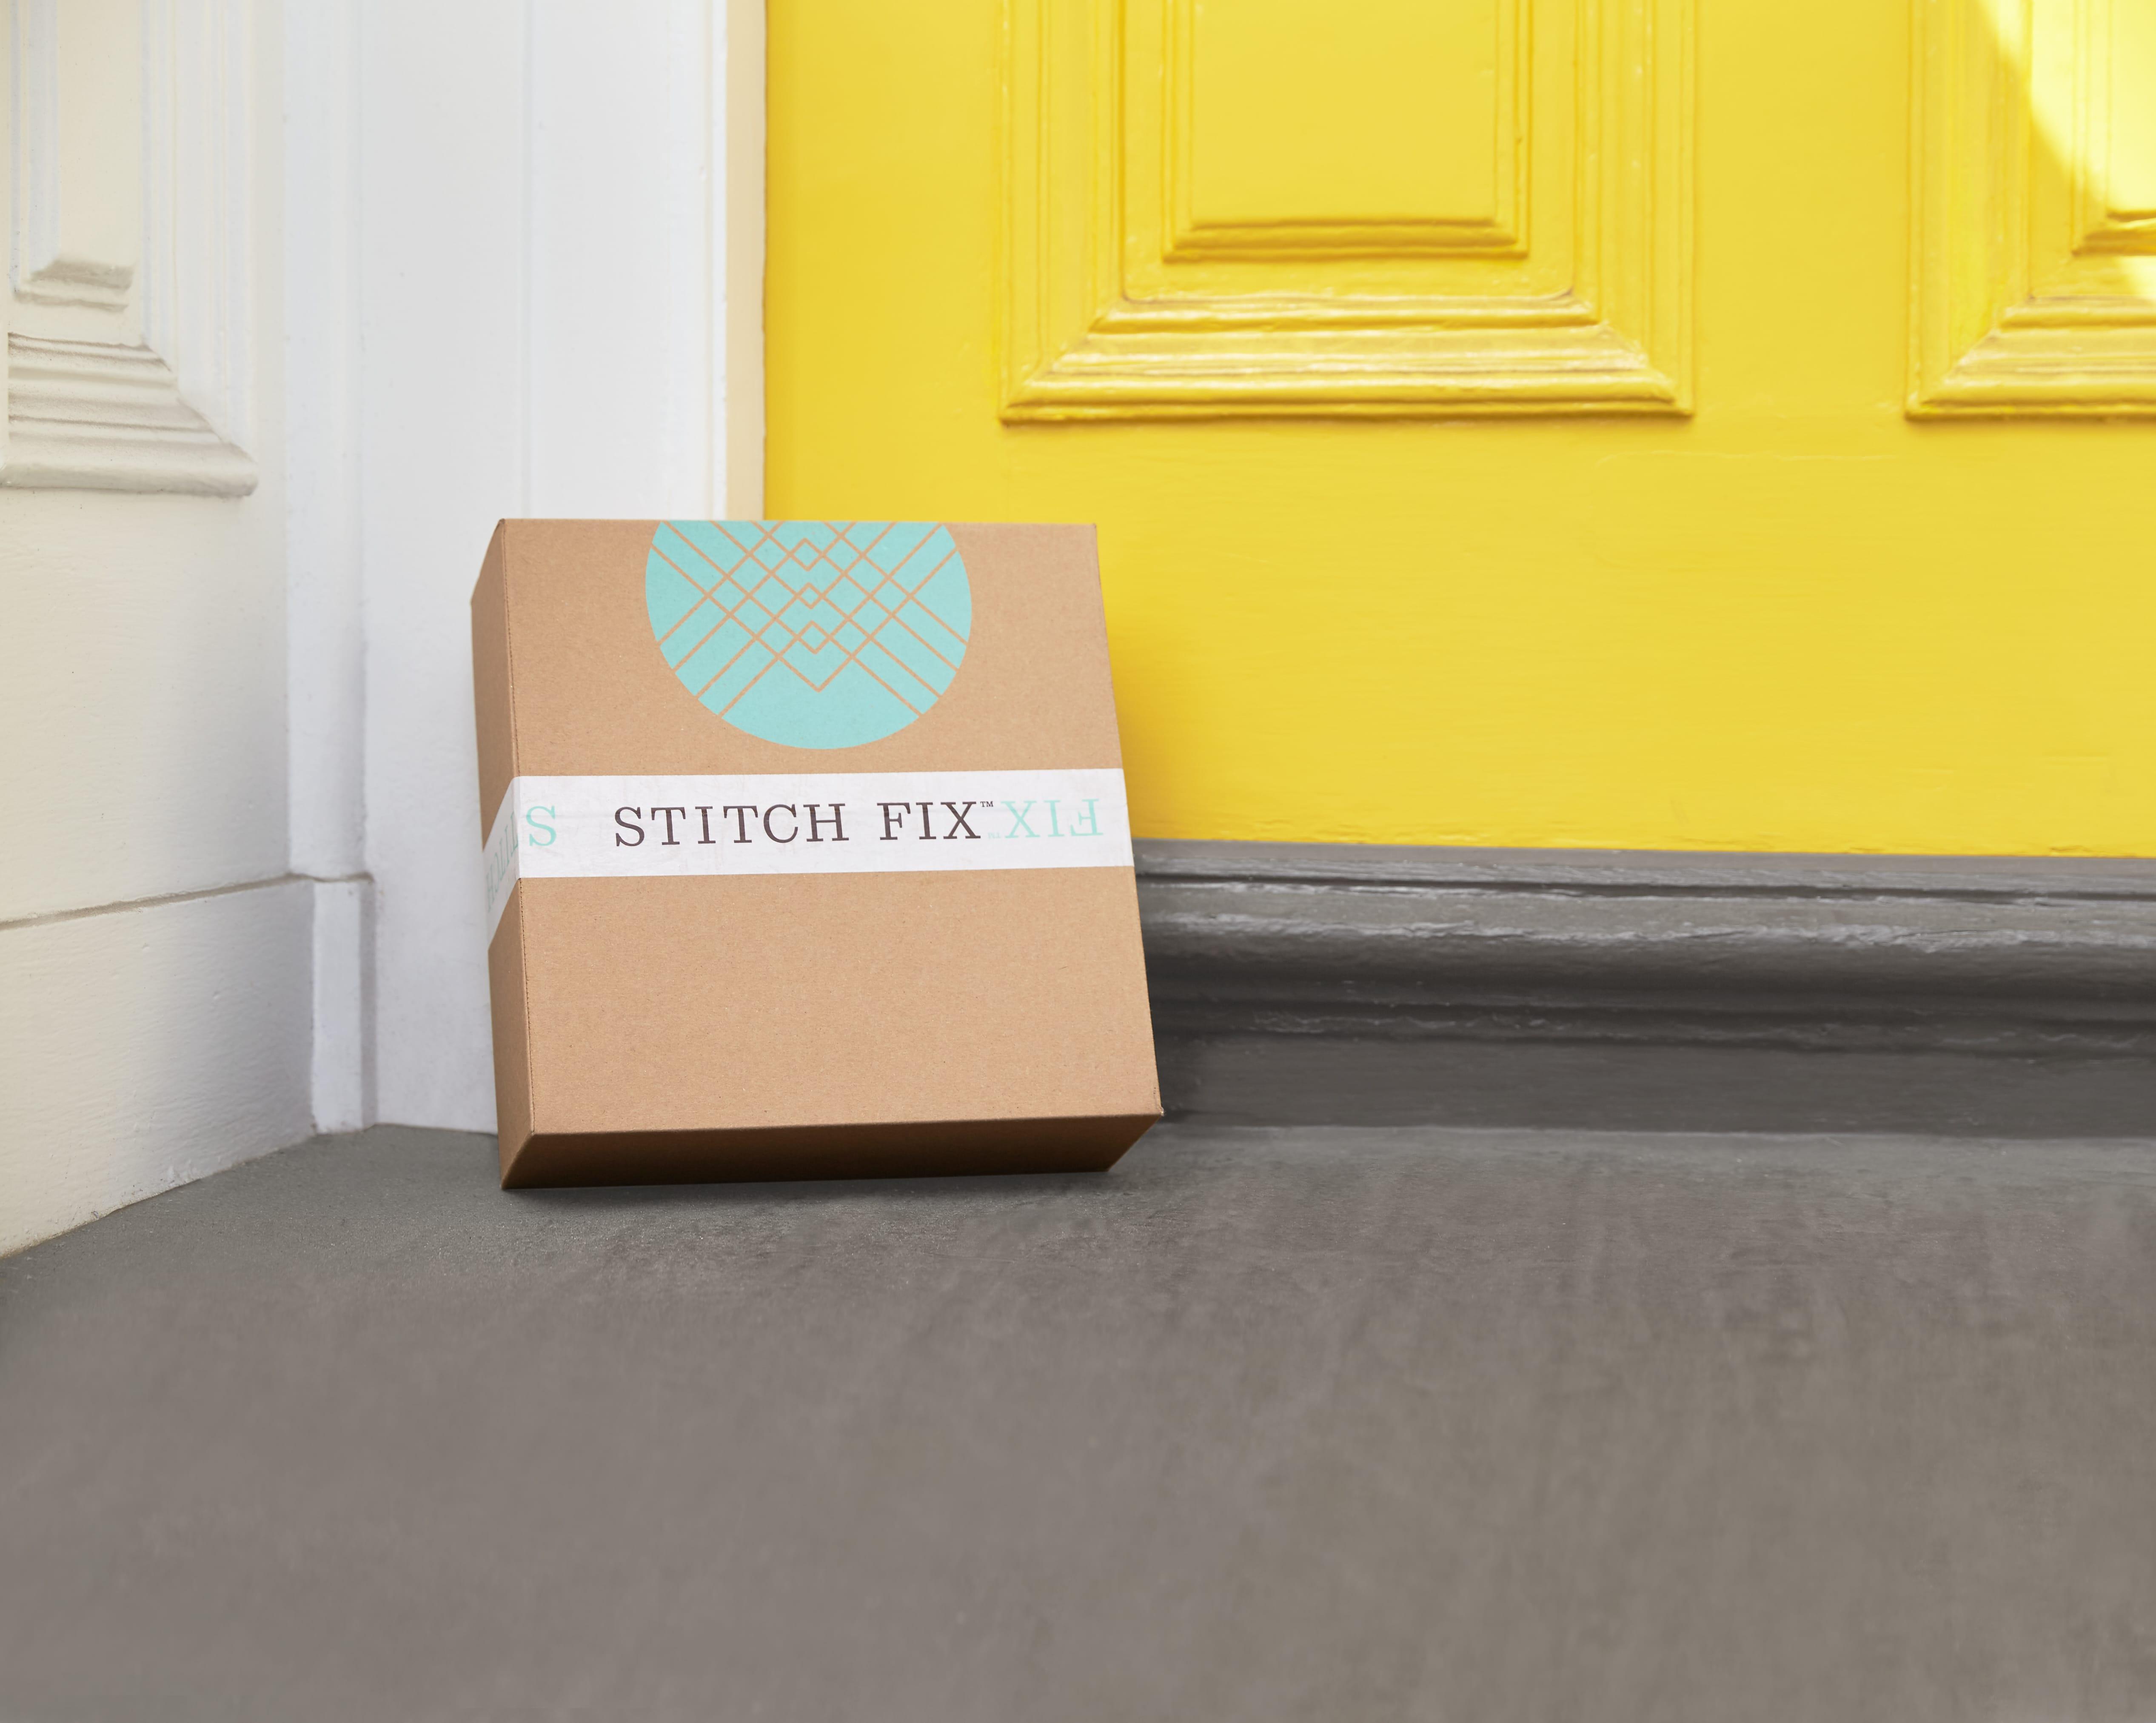 A Stitch Fix box resting against a doorstep.